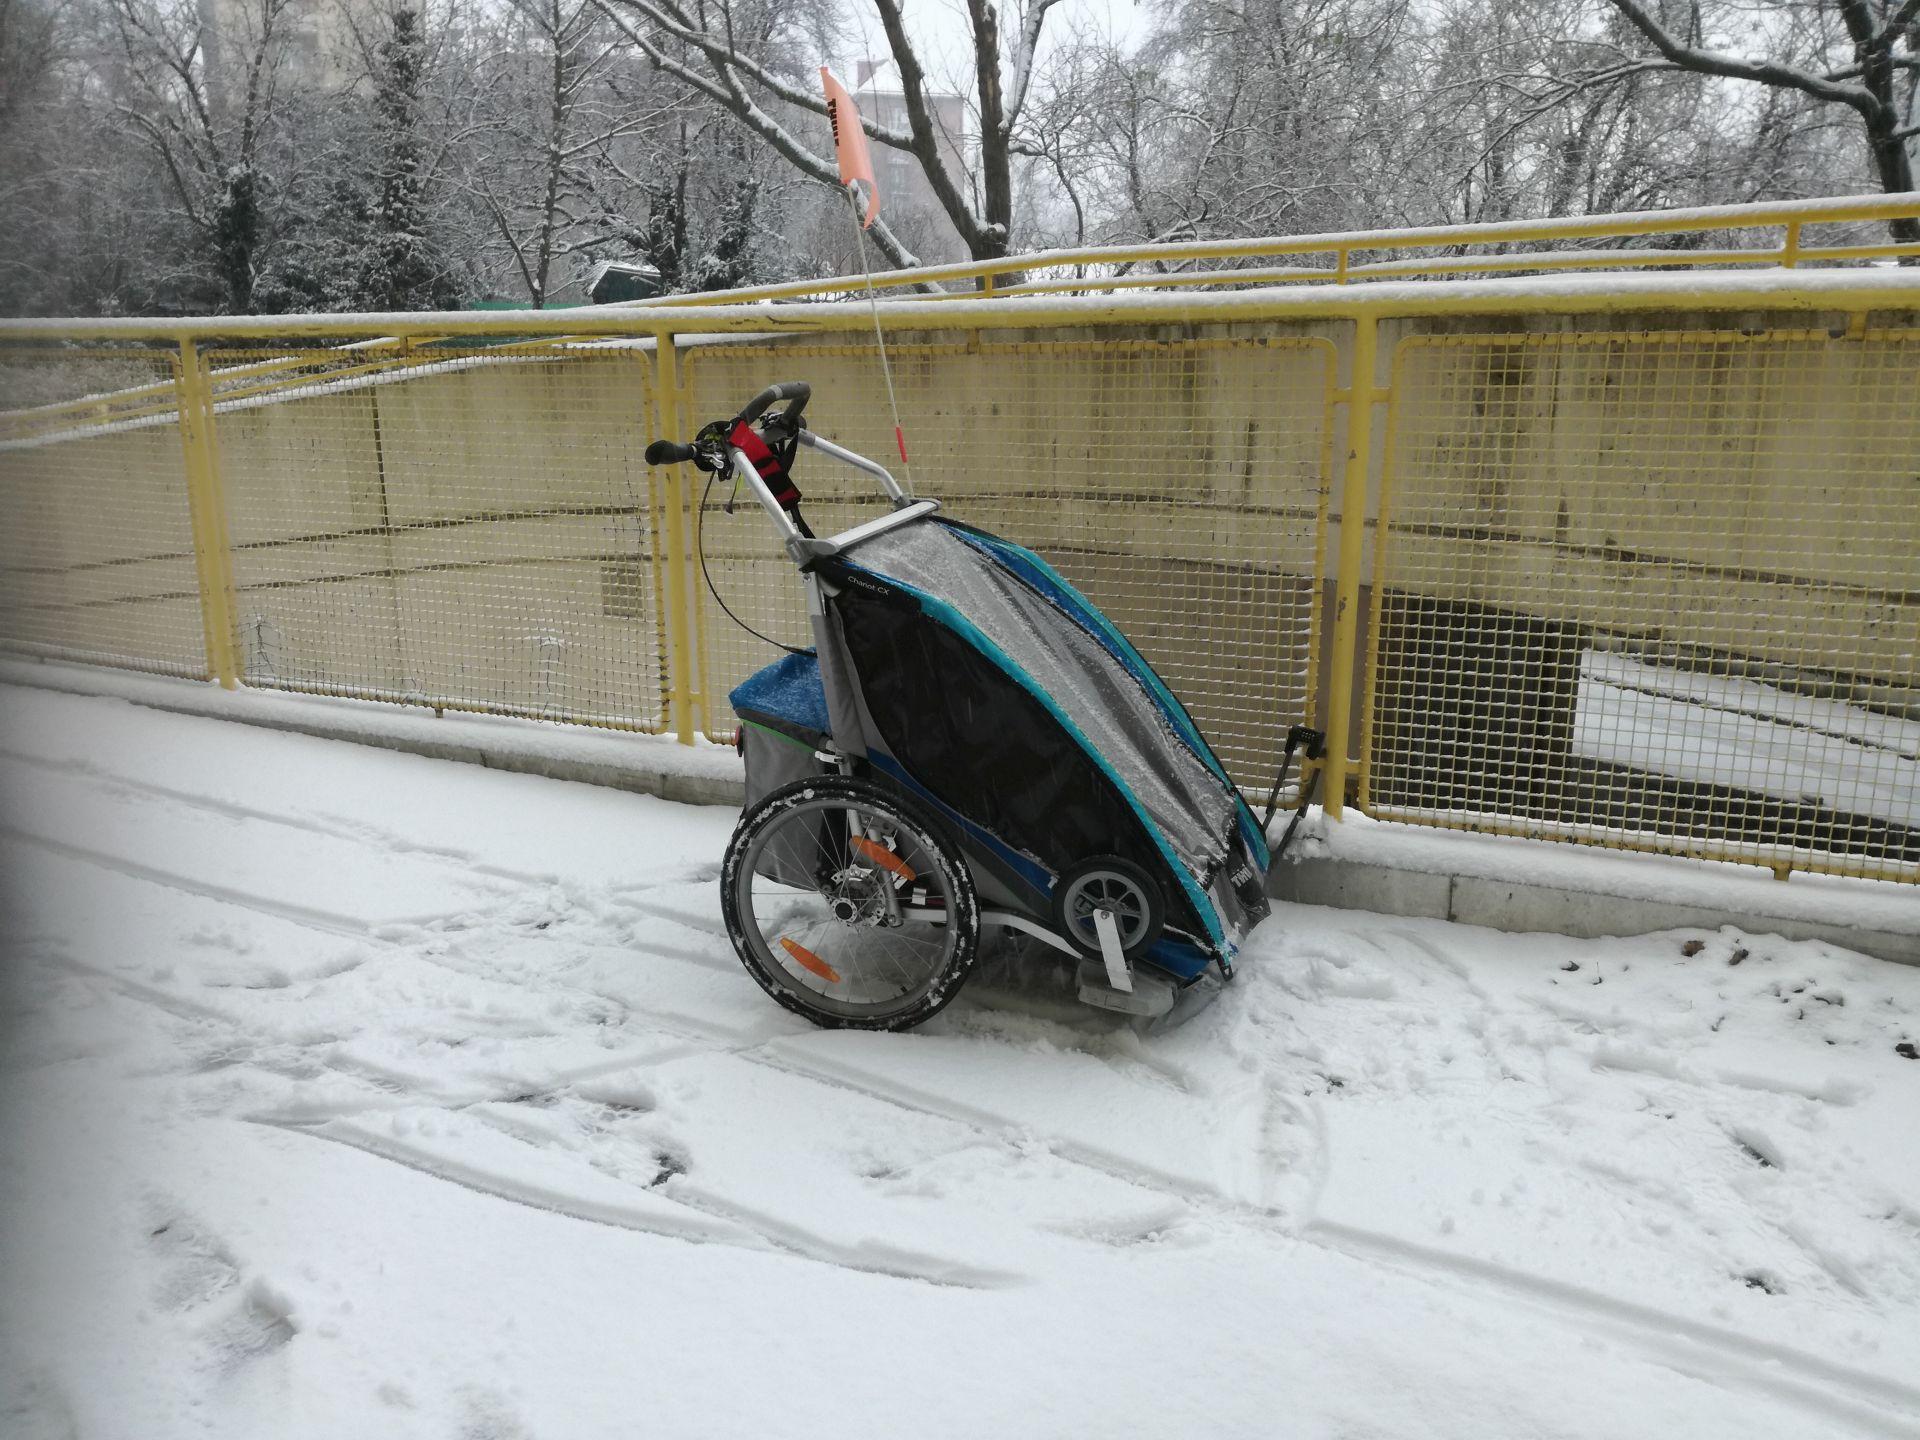 Angelikas Fahrradanhänger